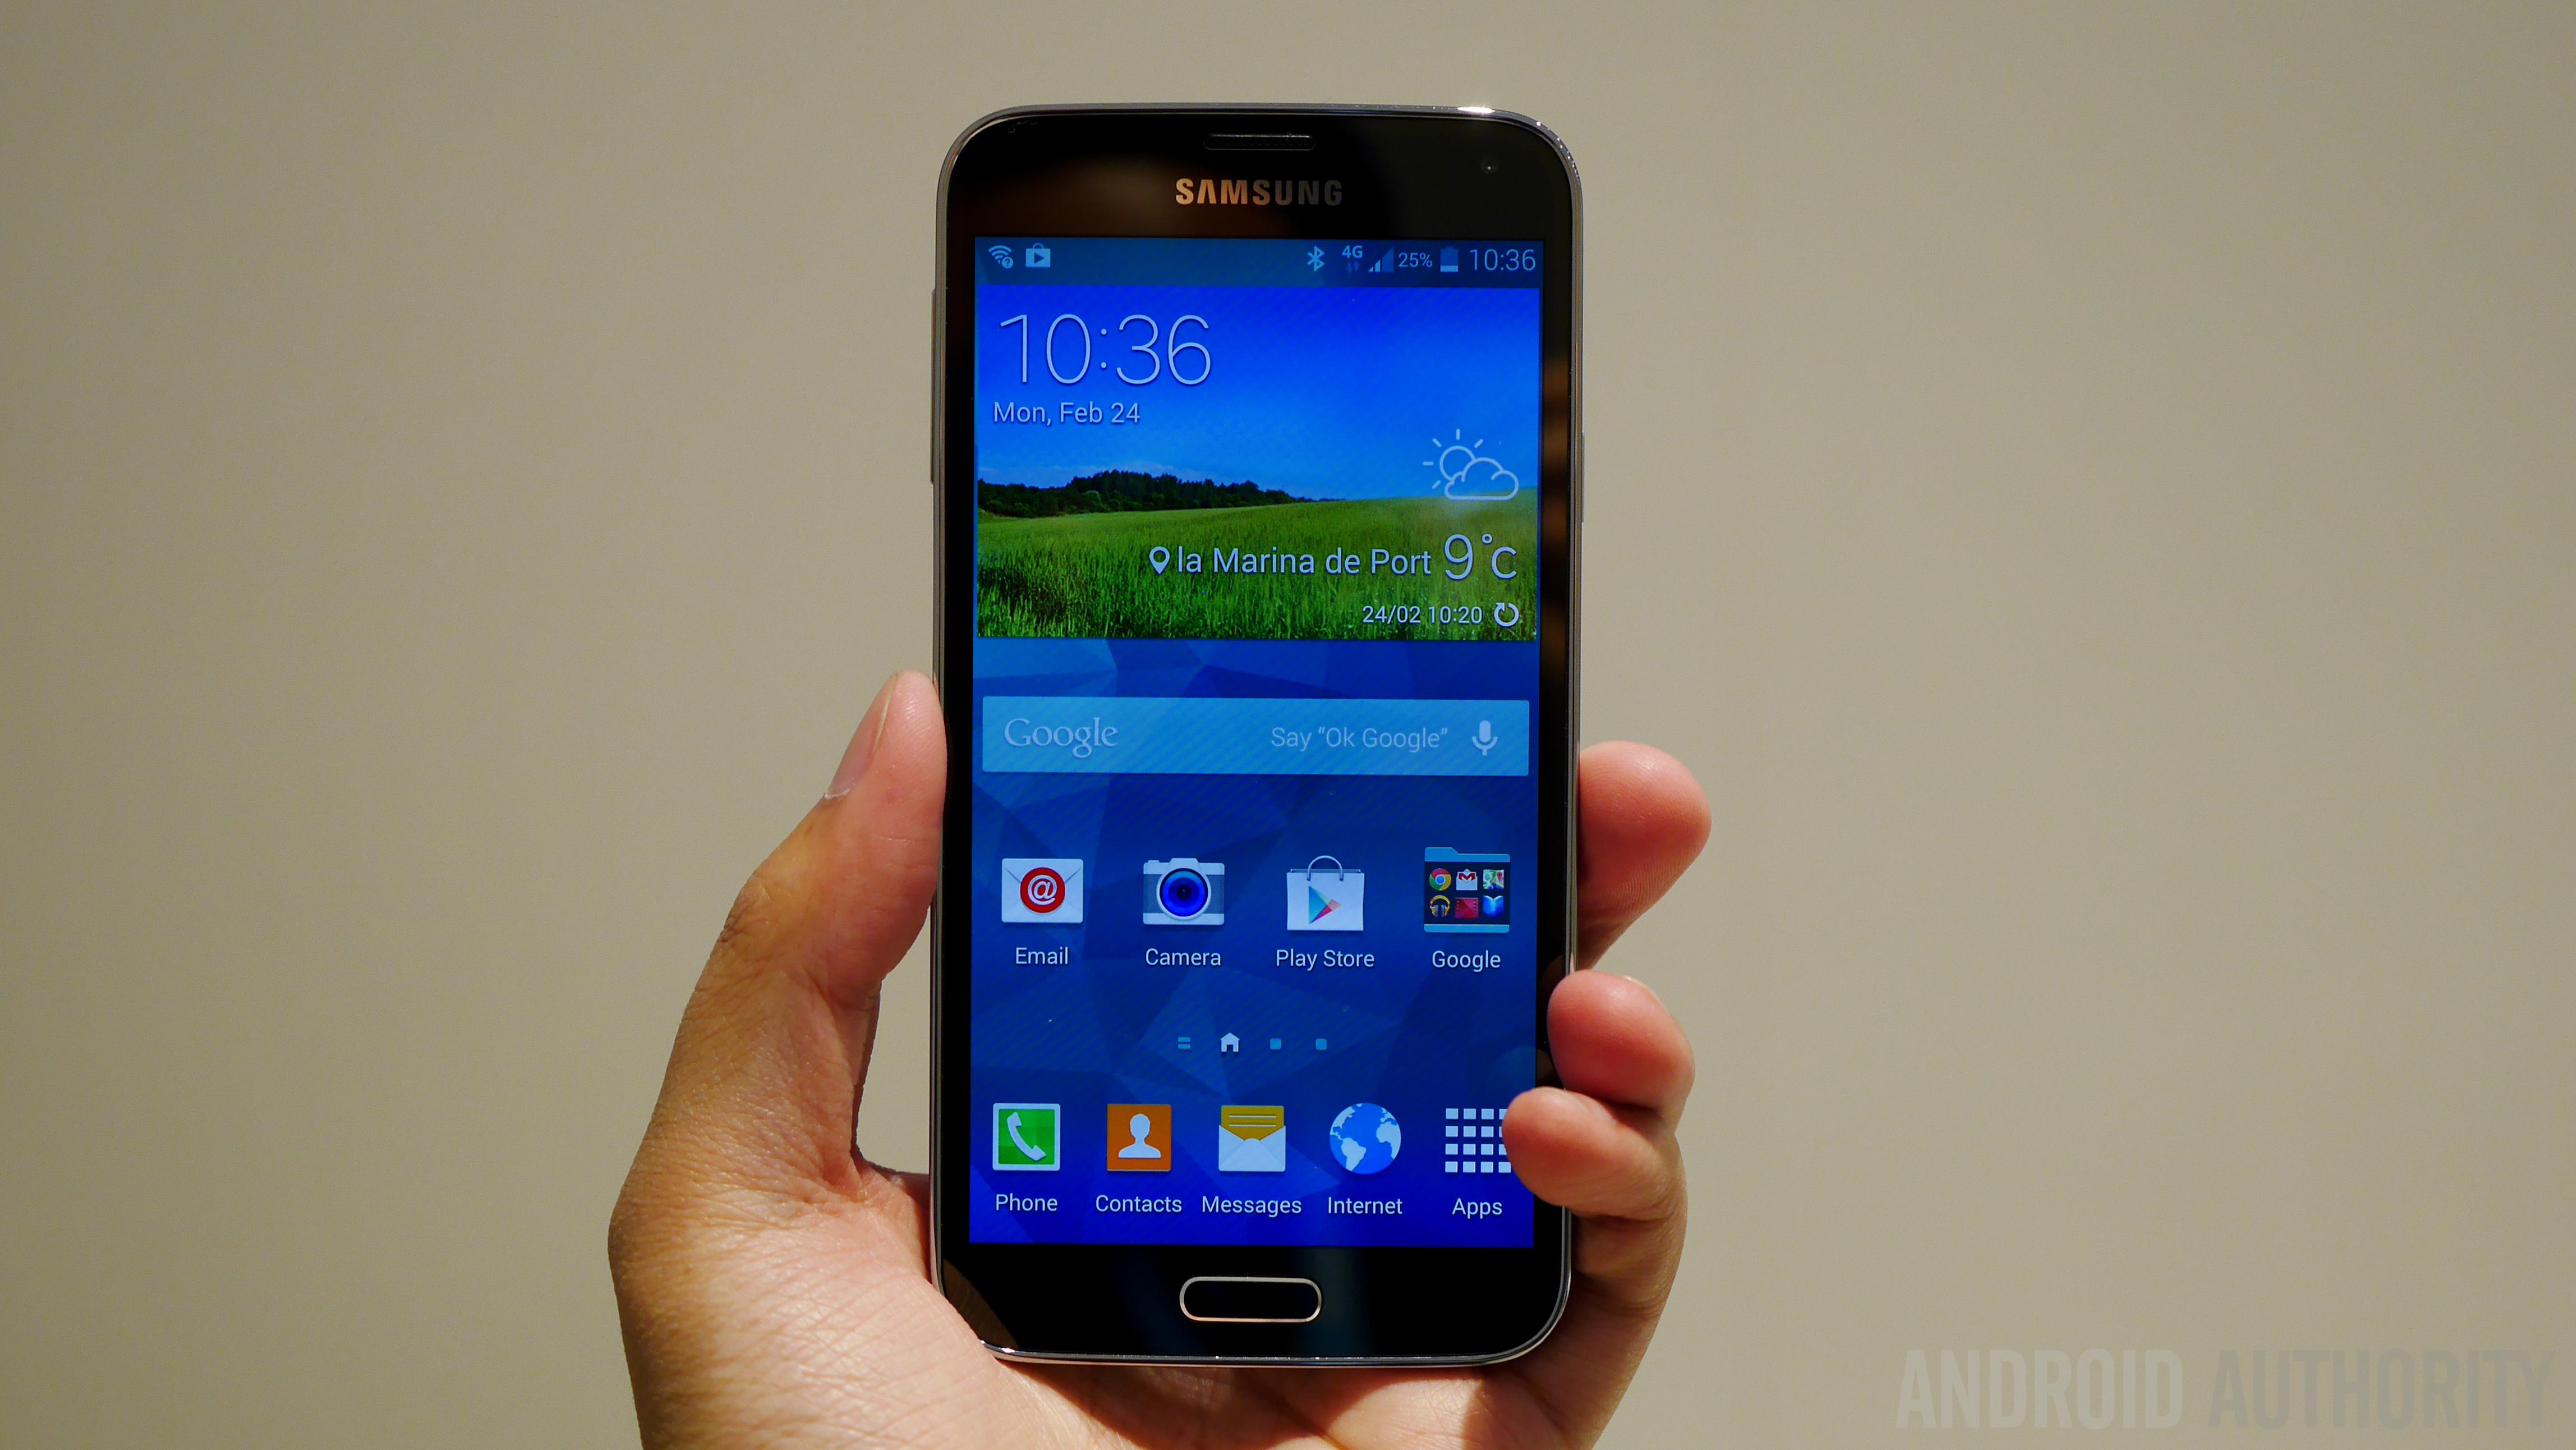 Samsung Galaxy S5 Hands on MWC 2014-1160053